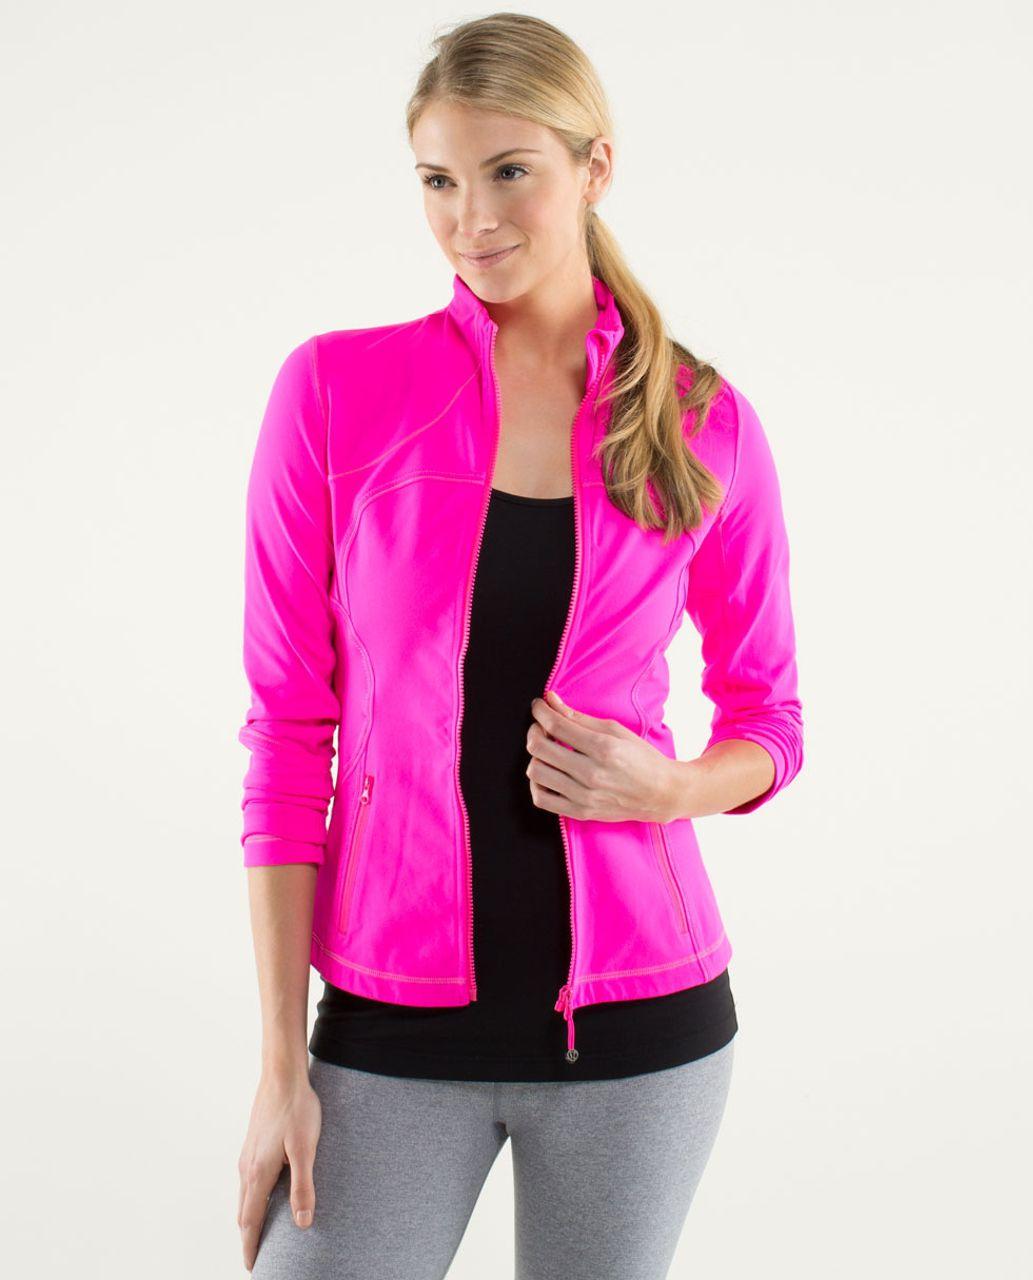 Lululemon Forme Jacket - Raspberry Glo Light